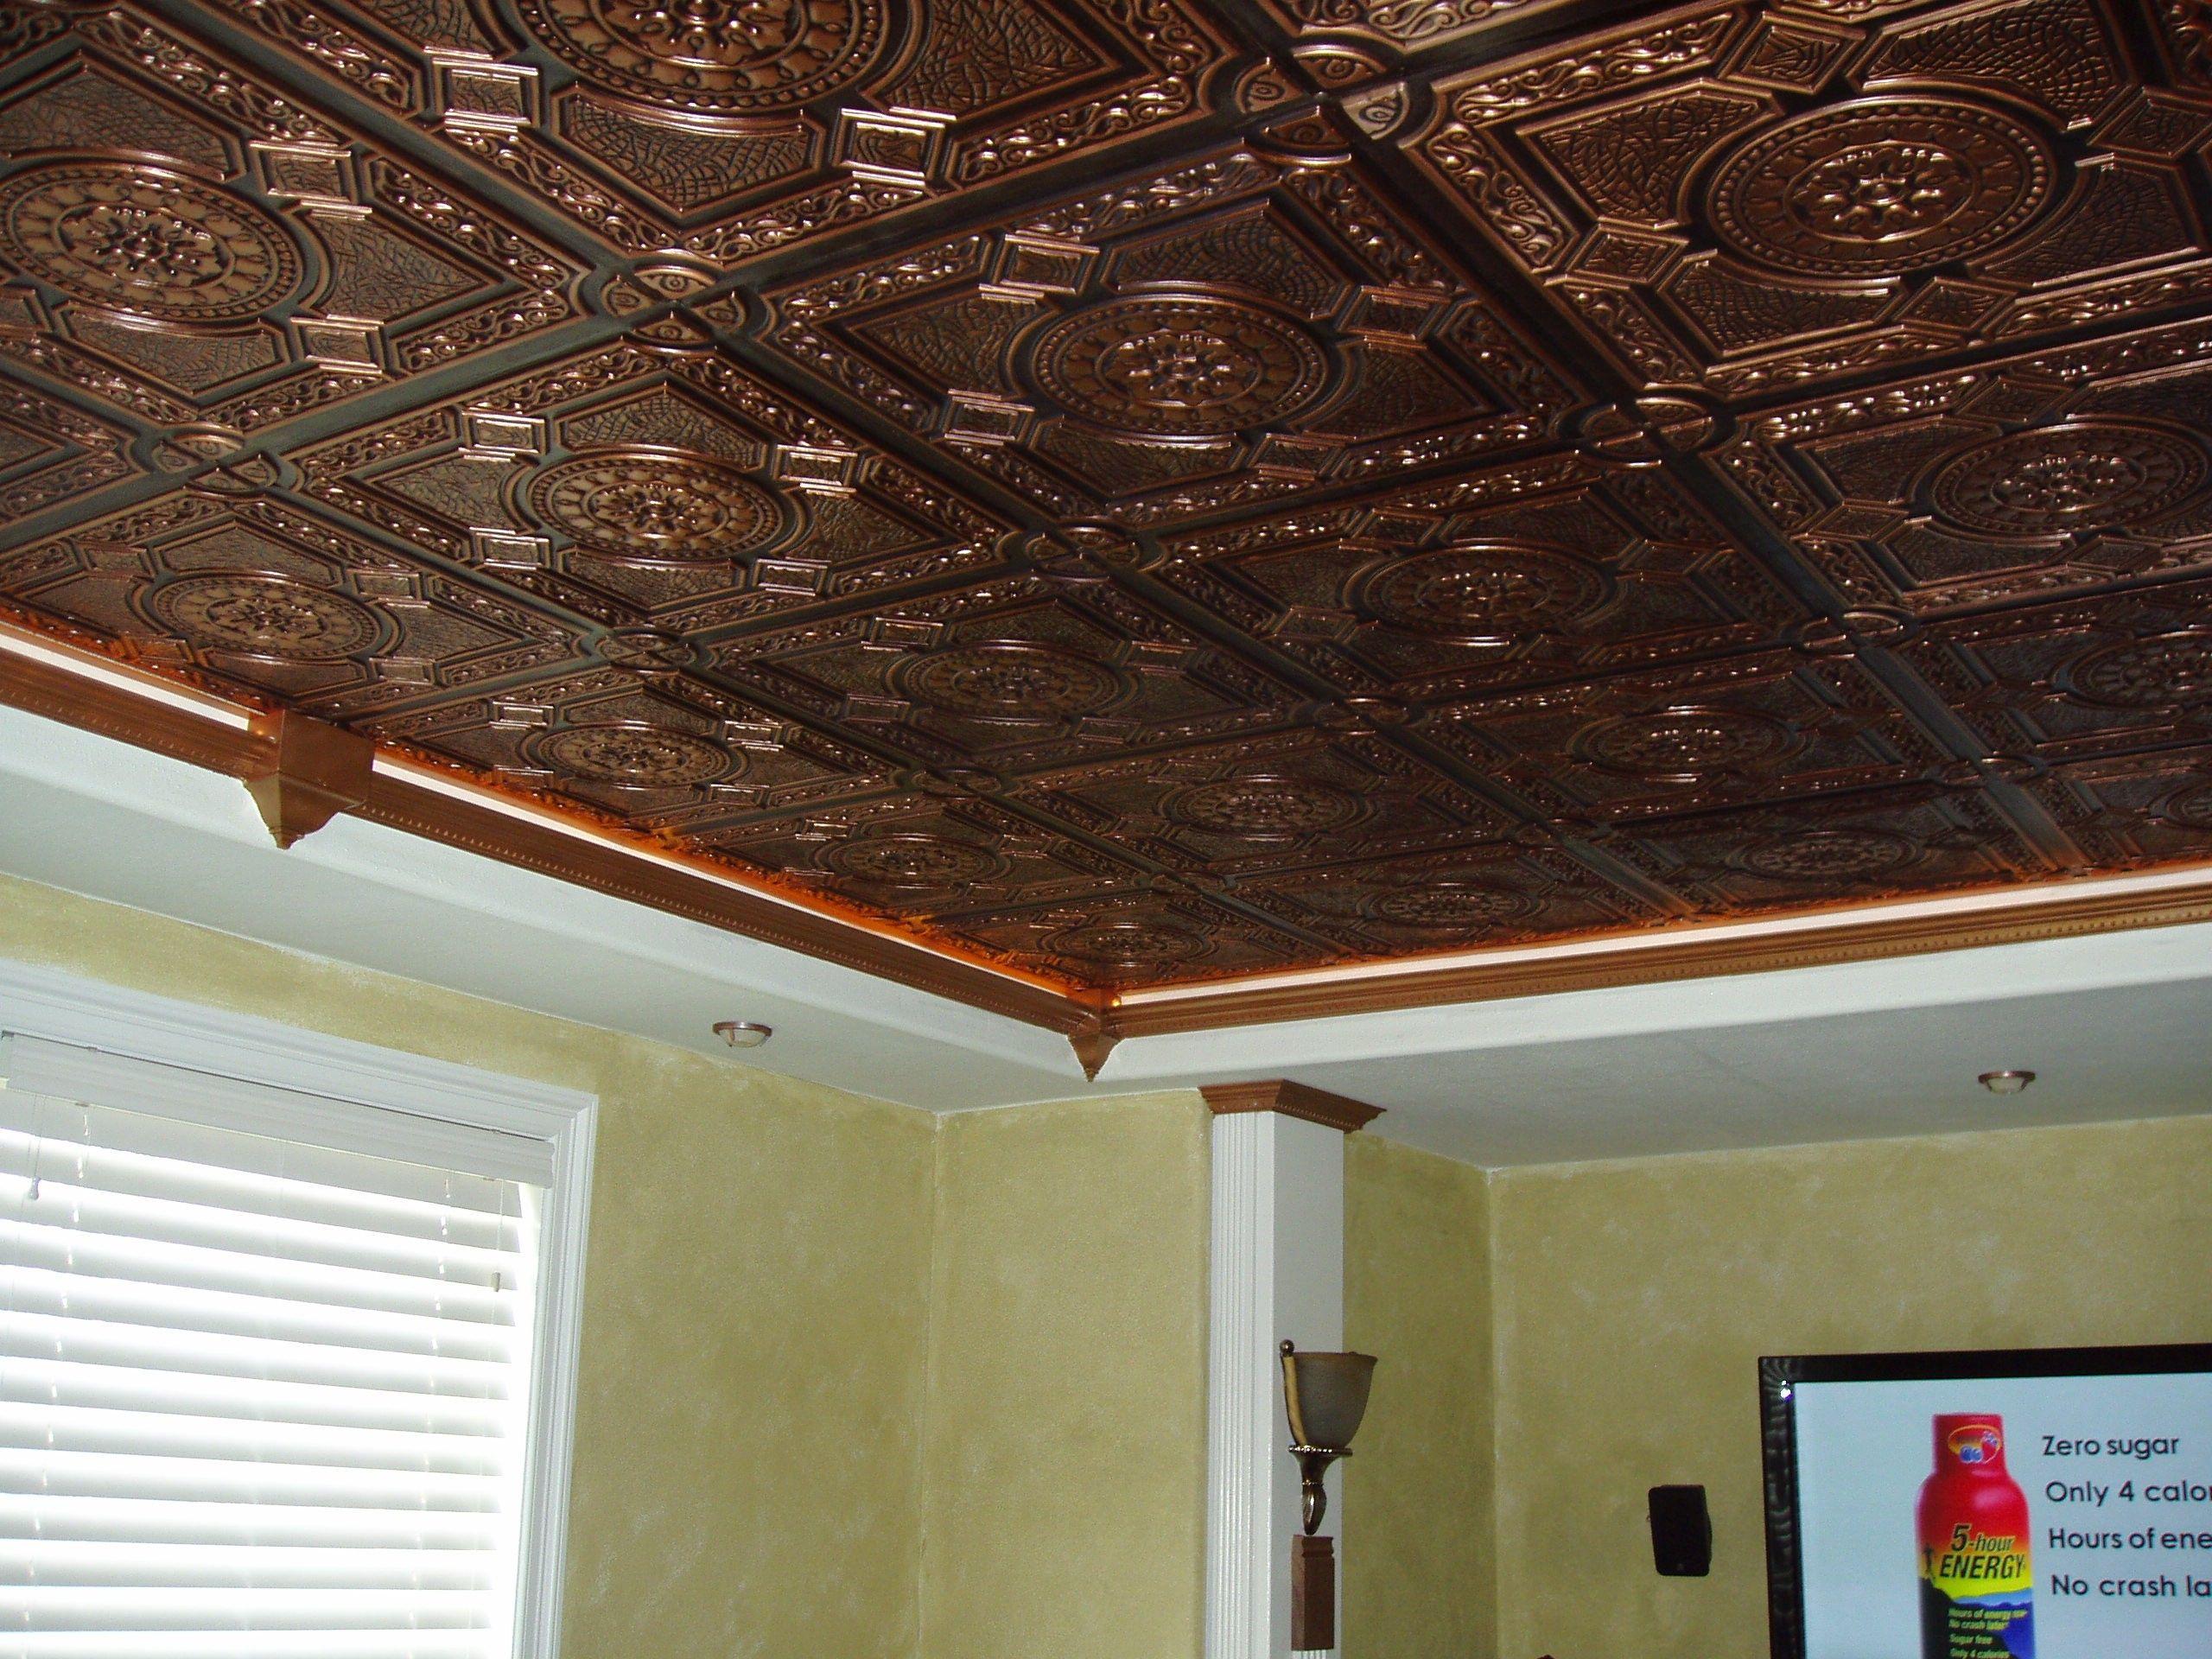 Ceiling Tiles Backsplash Or Photo Drop 303 Antique Copper For